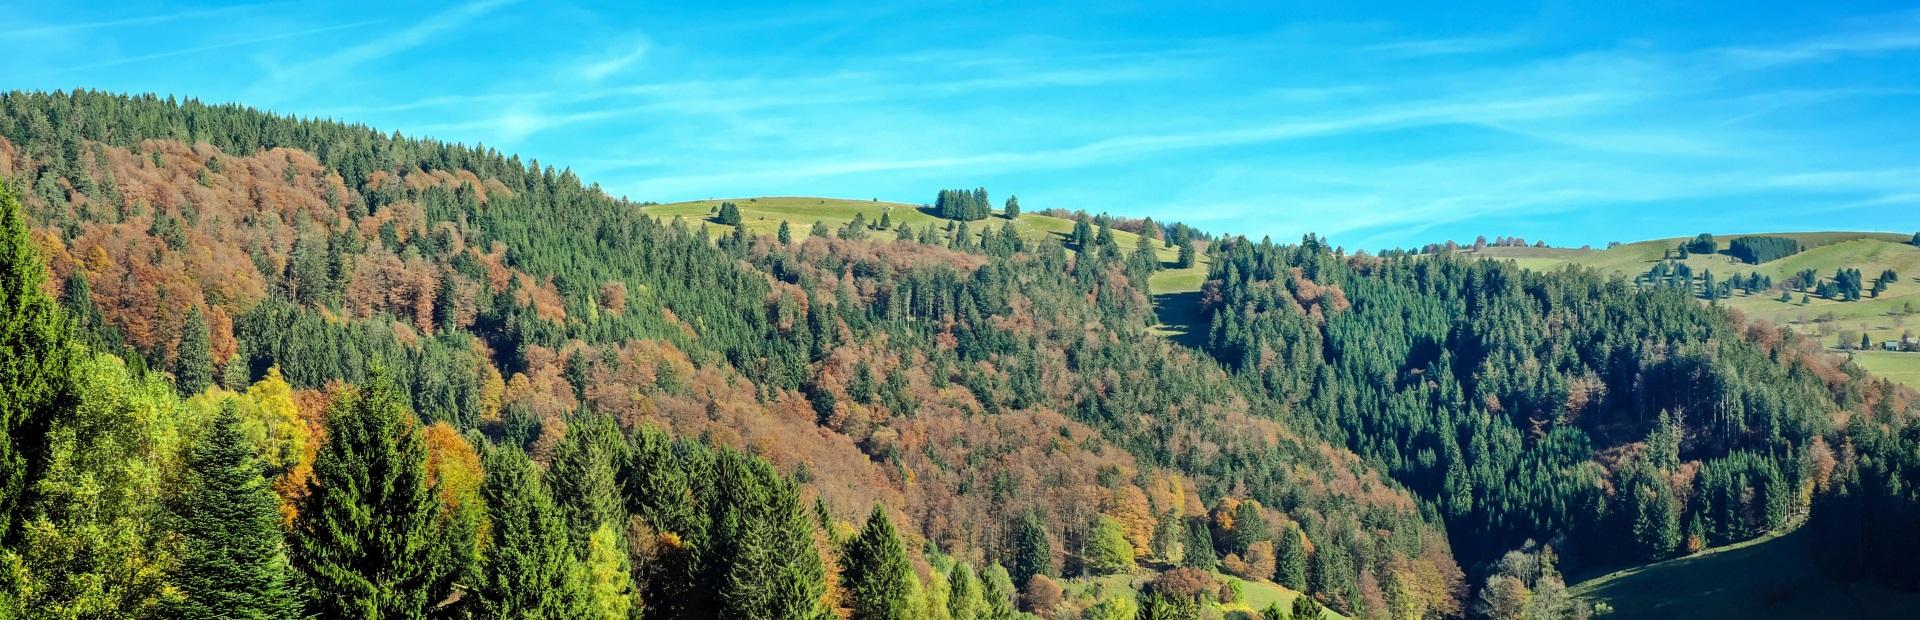 Schwarzwald Landschaft - Natur pur